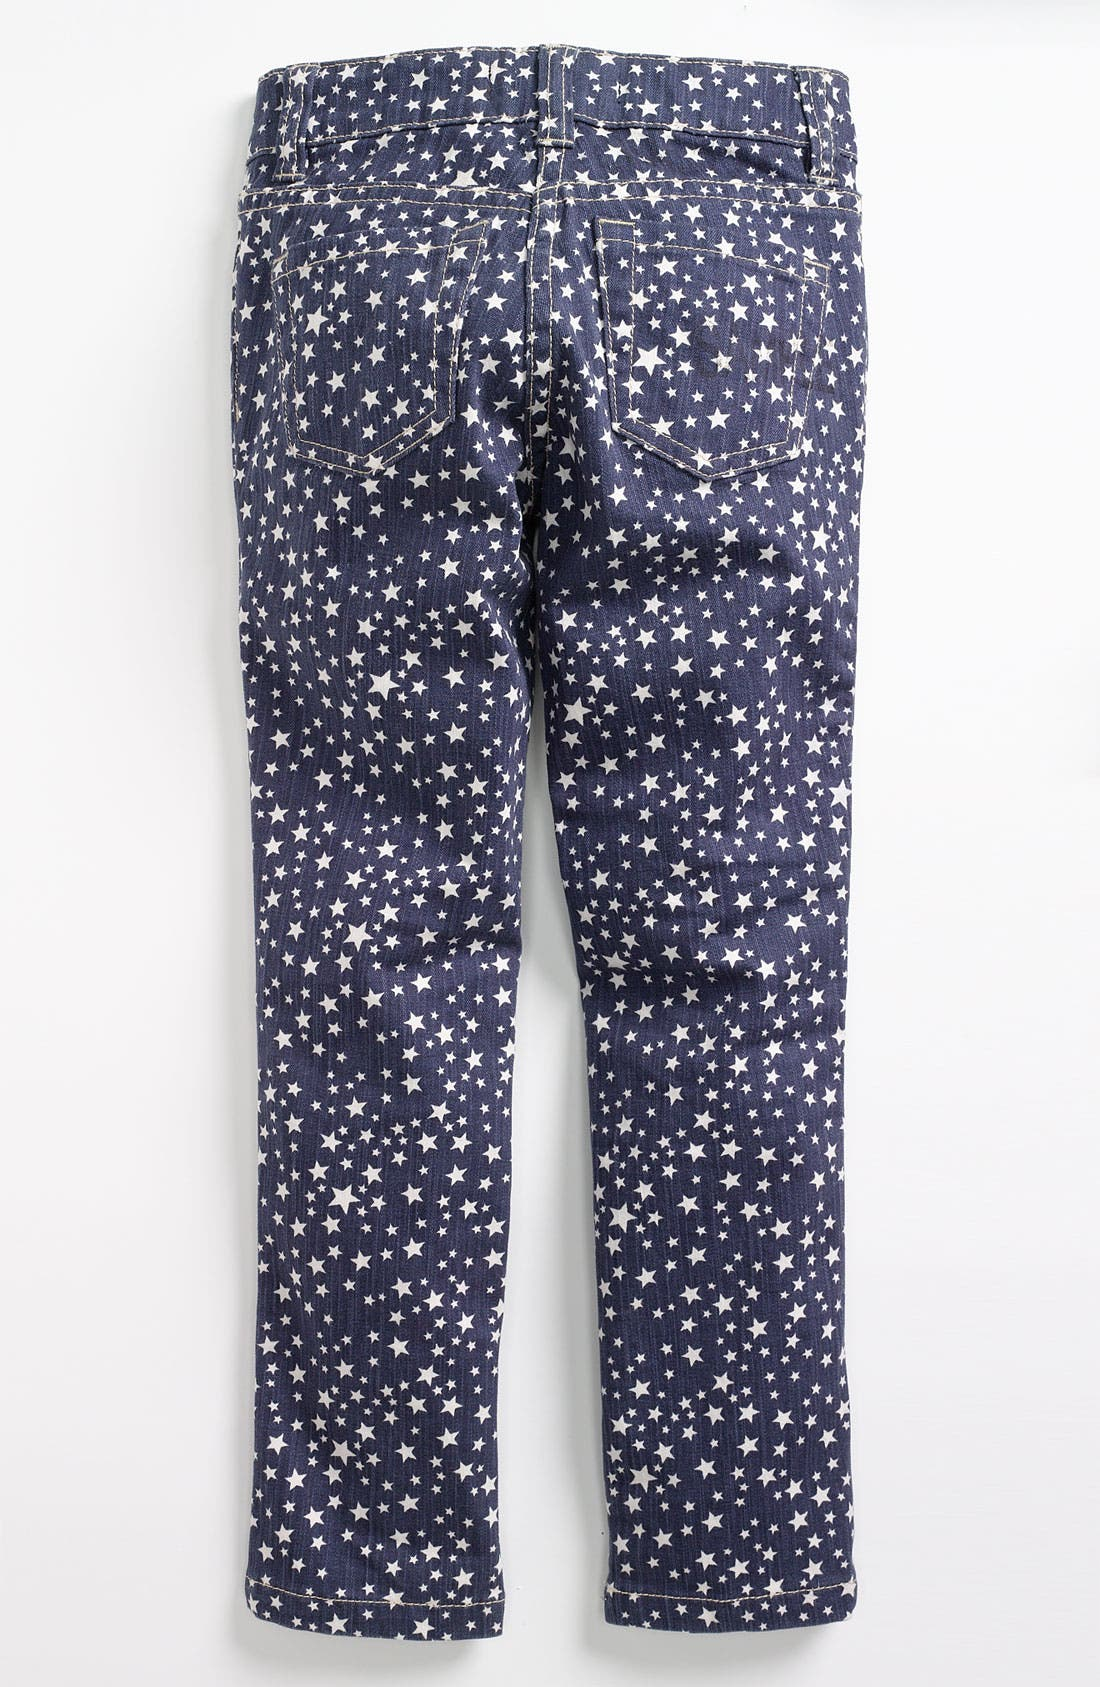 Alternate Image 1 Selected - Mini Boden Print Jeans (Toddler)